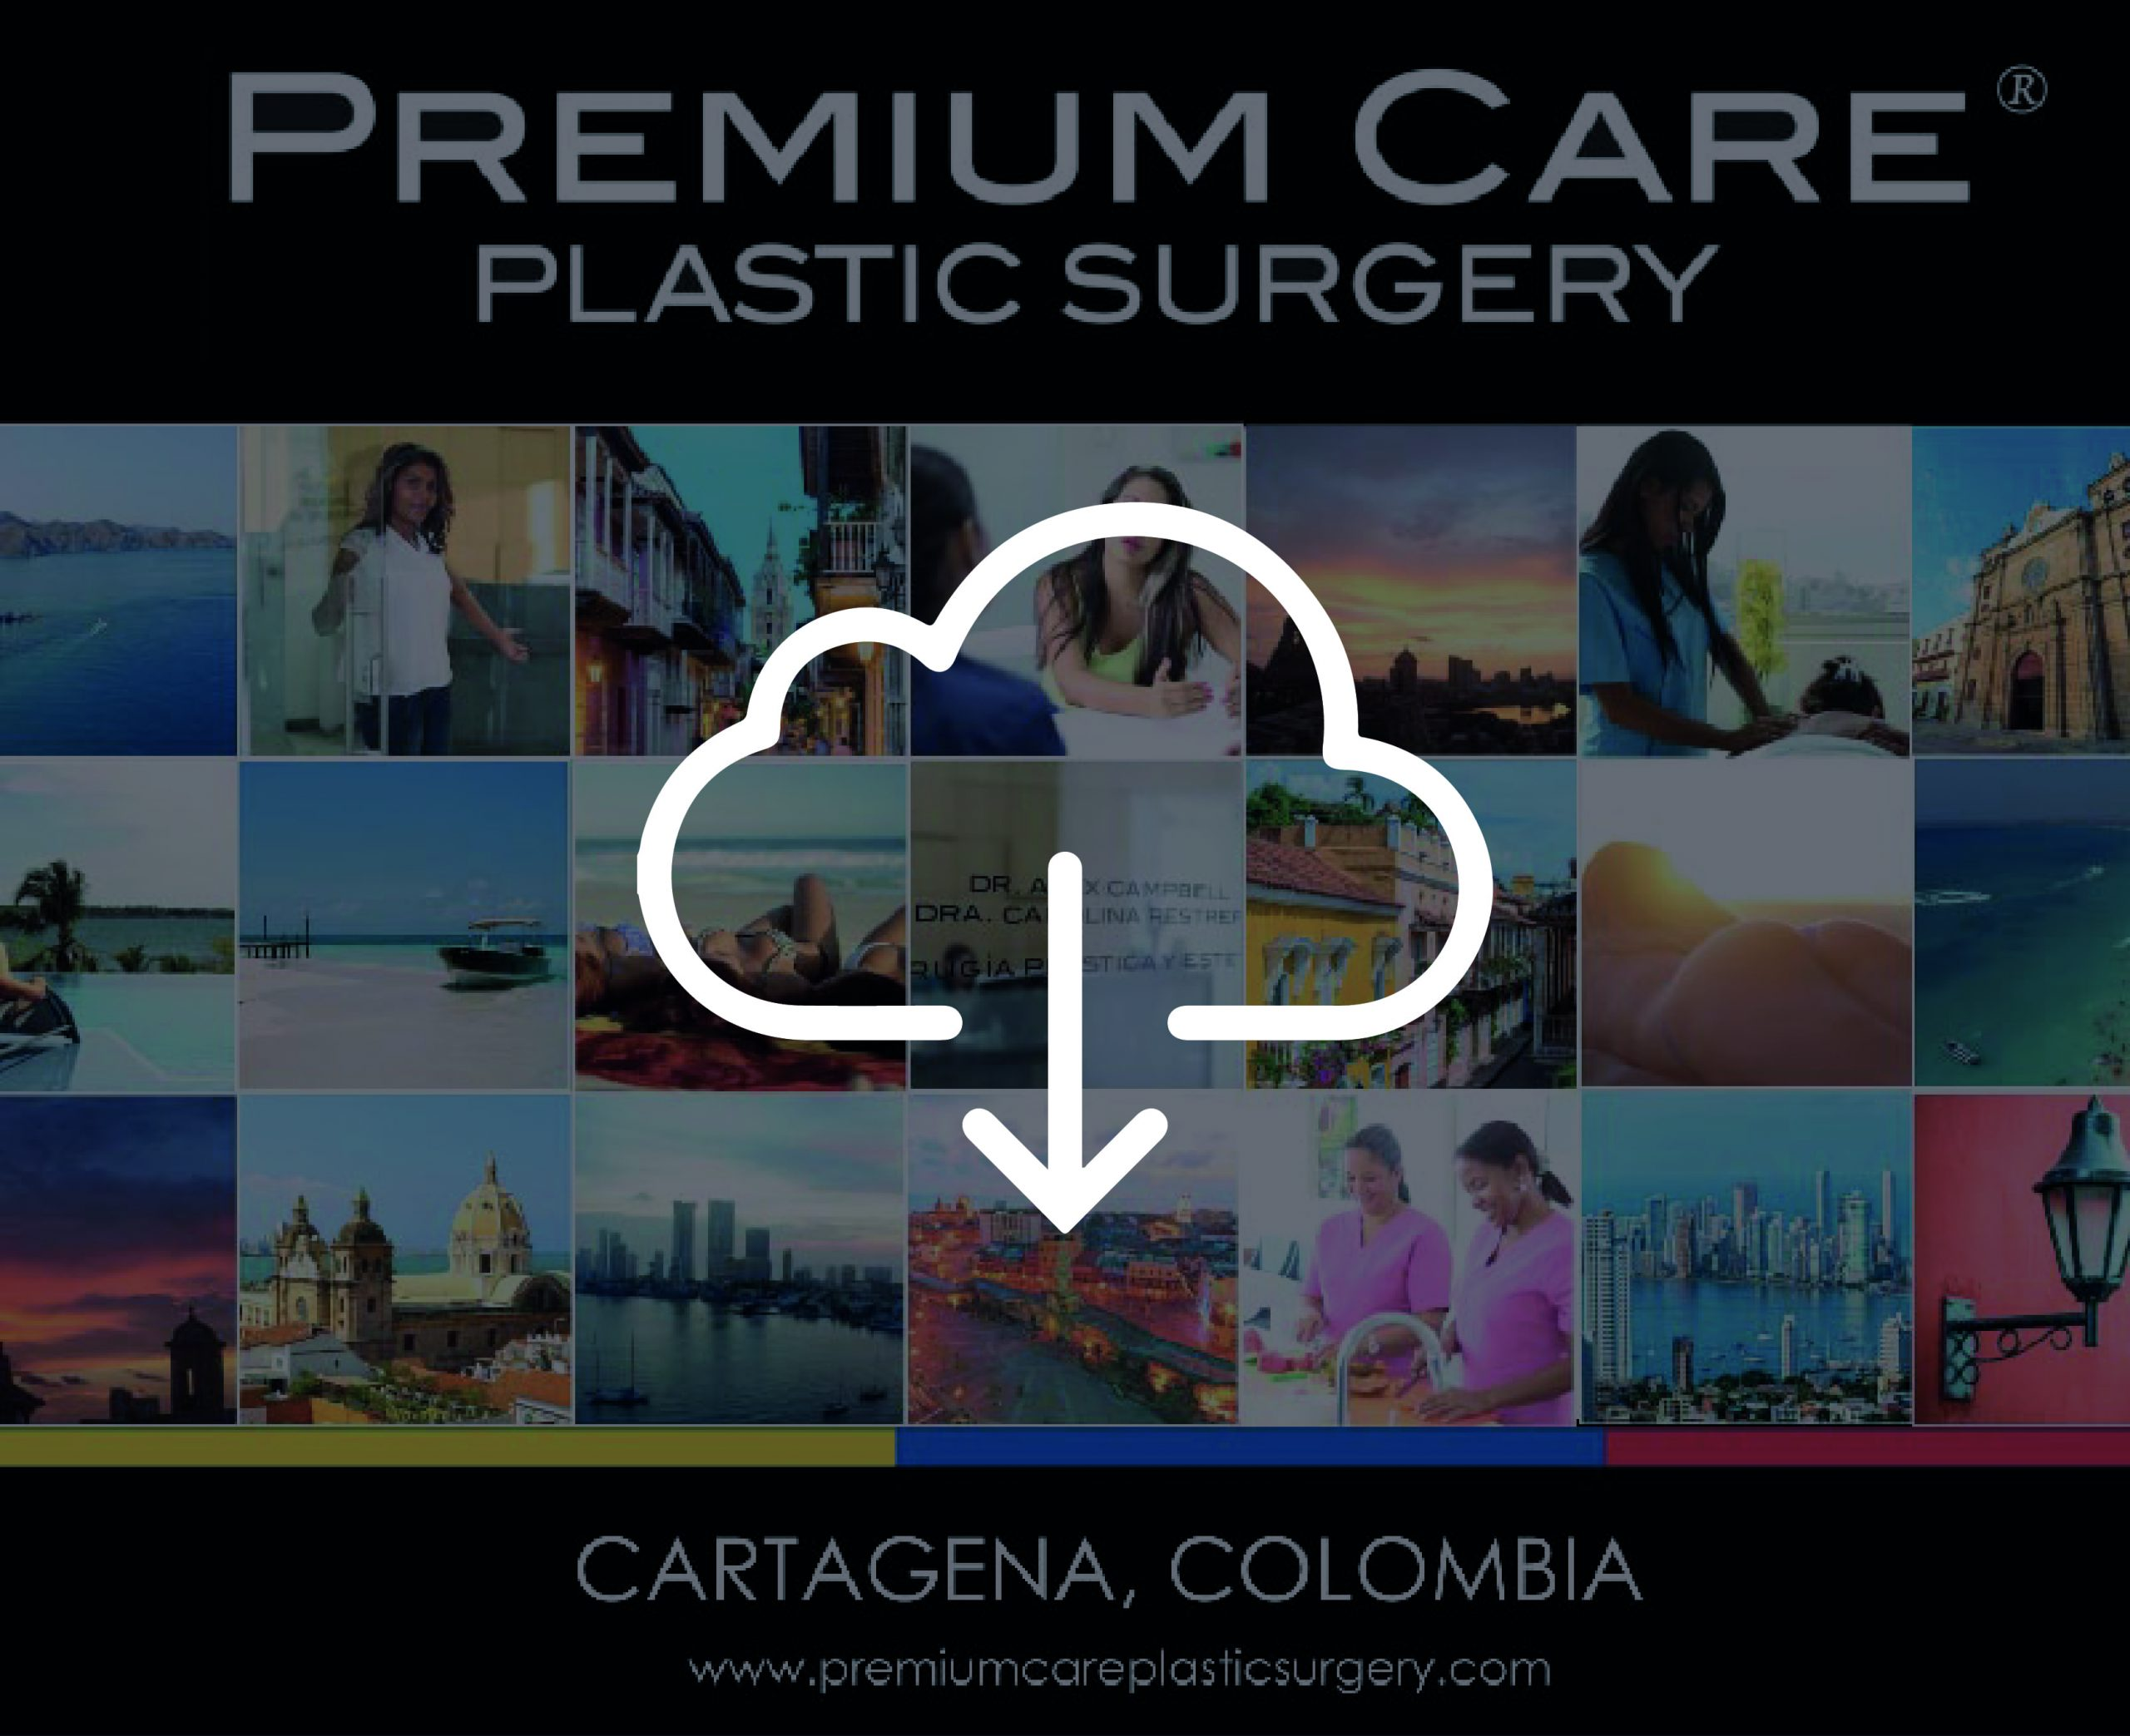 Download iBook - Premium Care- Plastic Surgery Colombia